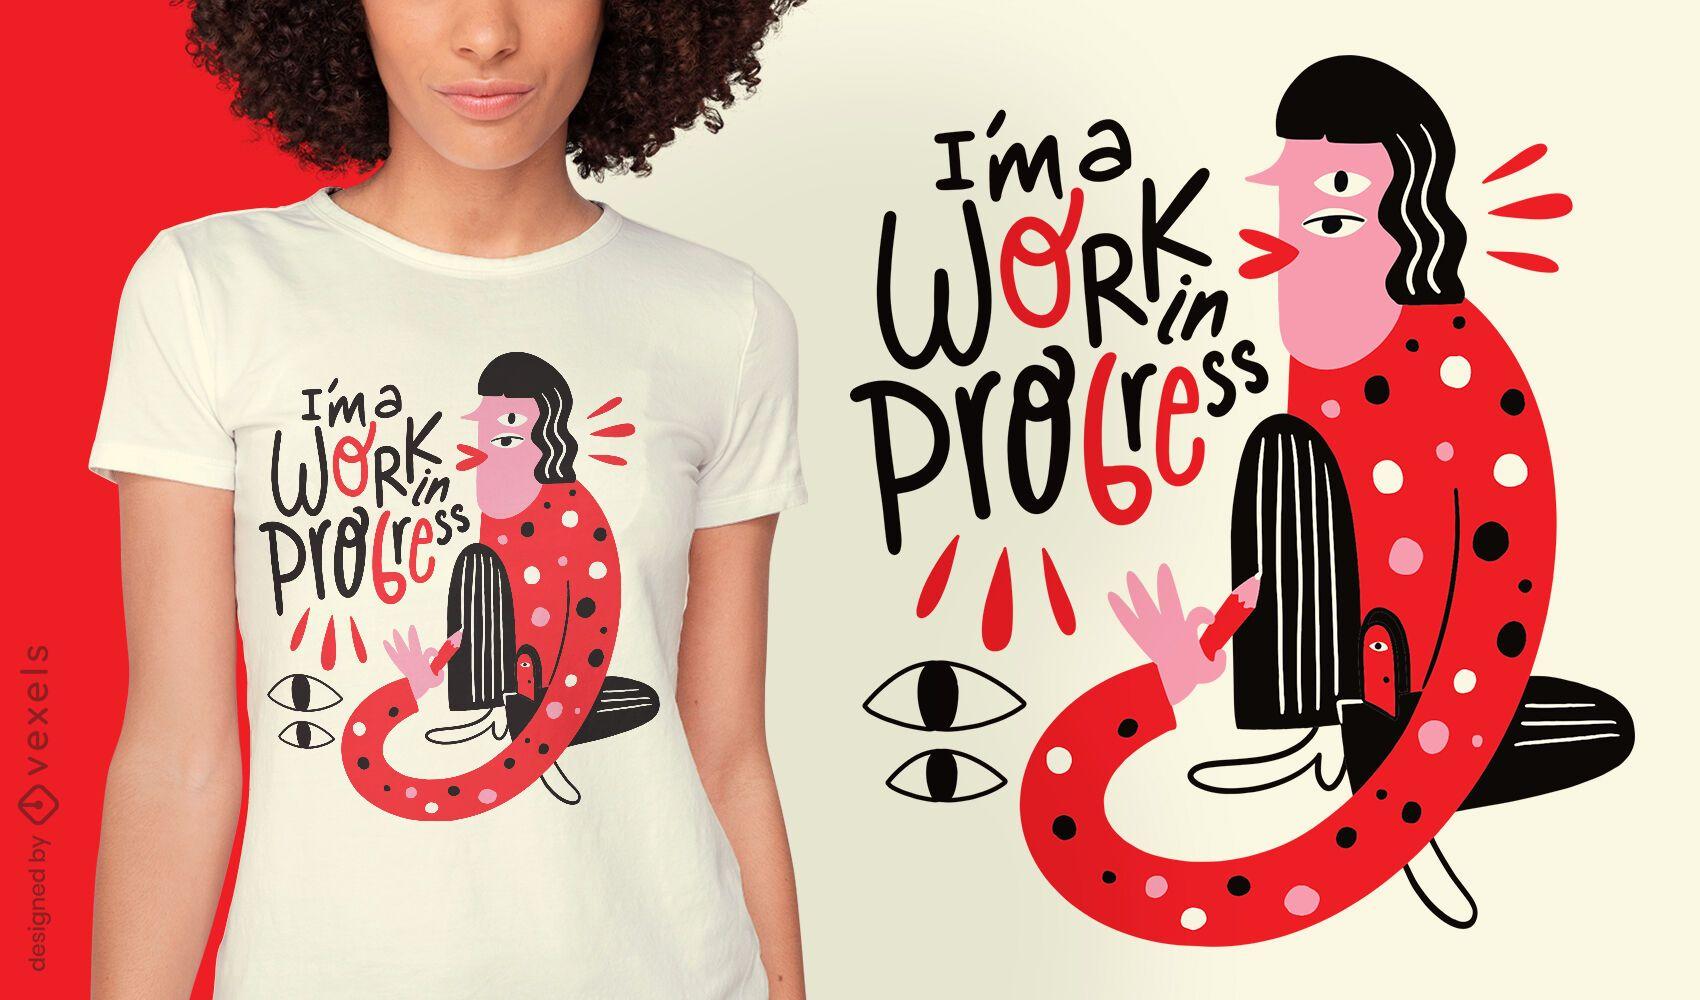 Diseño de camiseta de criatura abstracta de motivación.